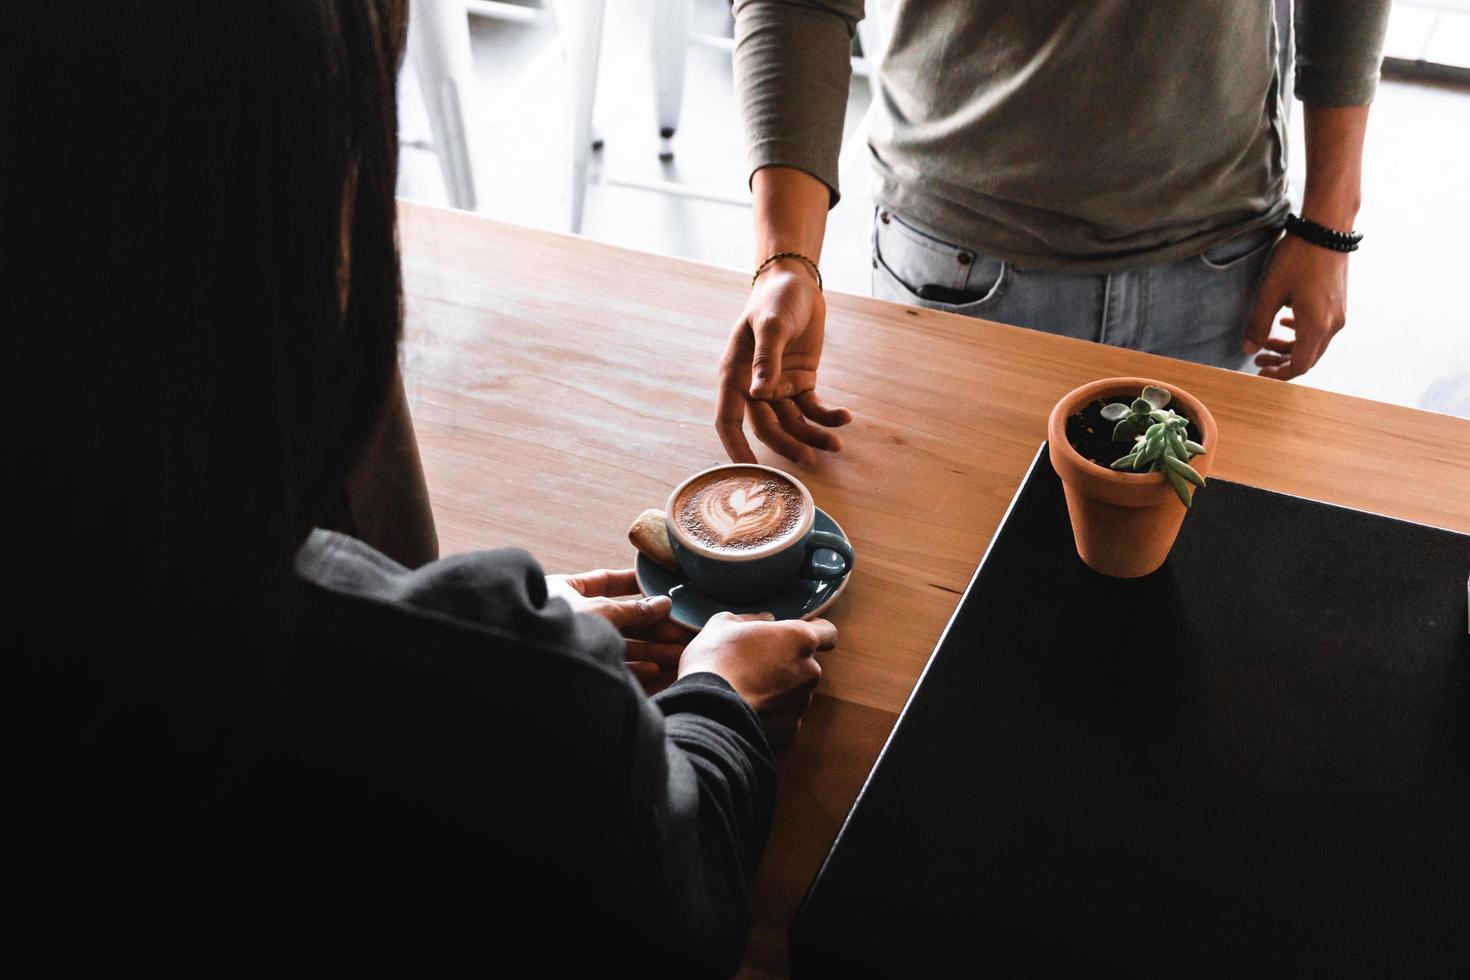 persoon achter balie die koffie aan klant overhandigt foto